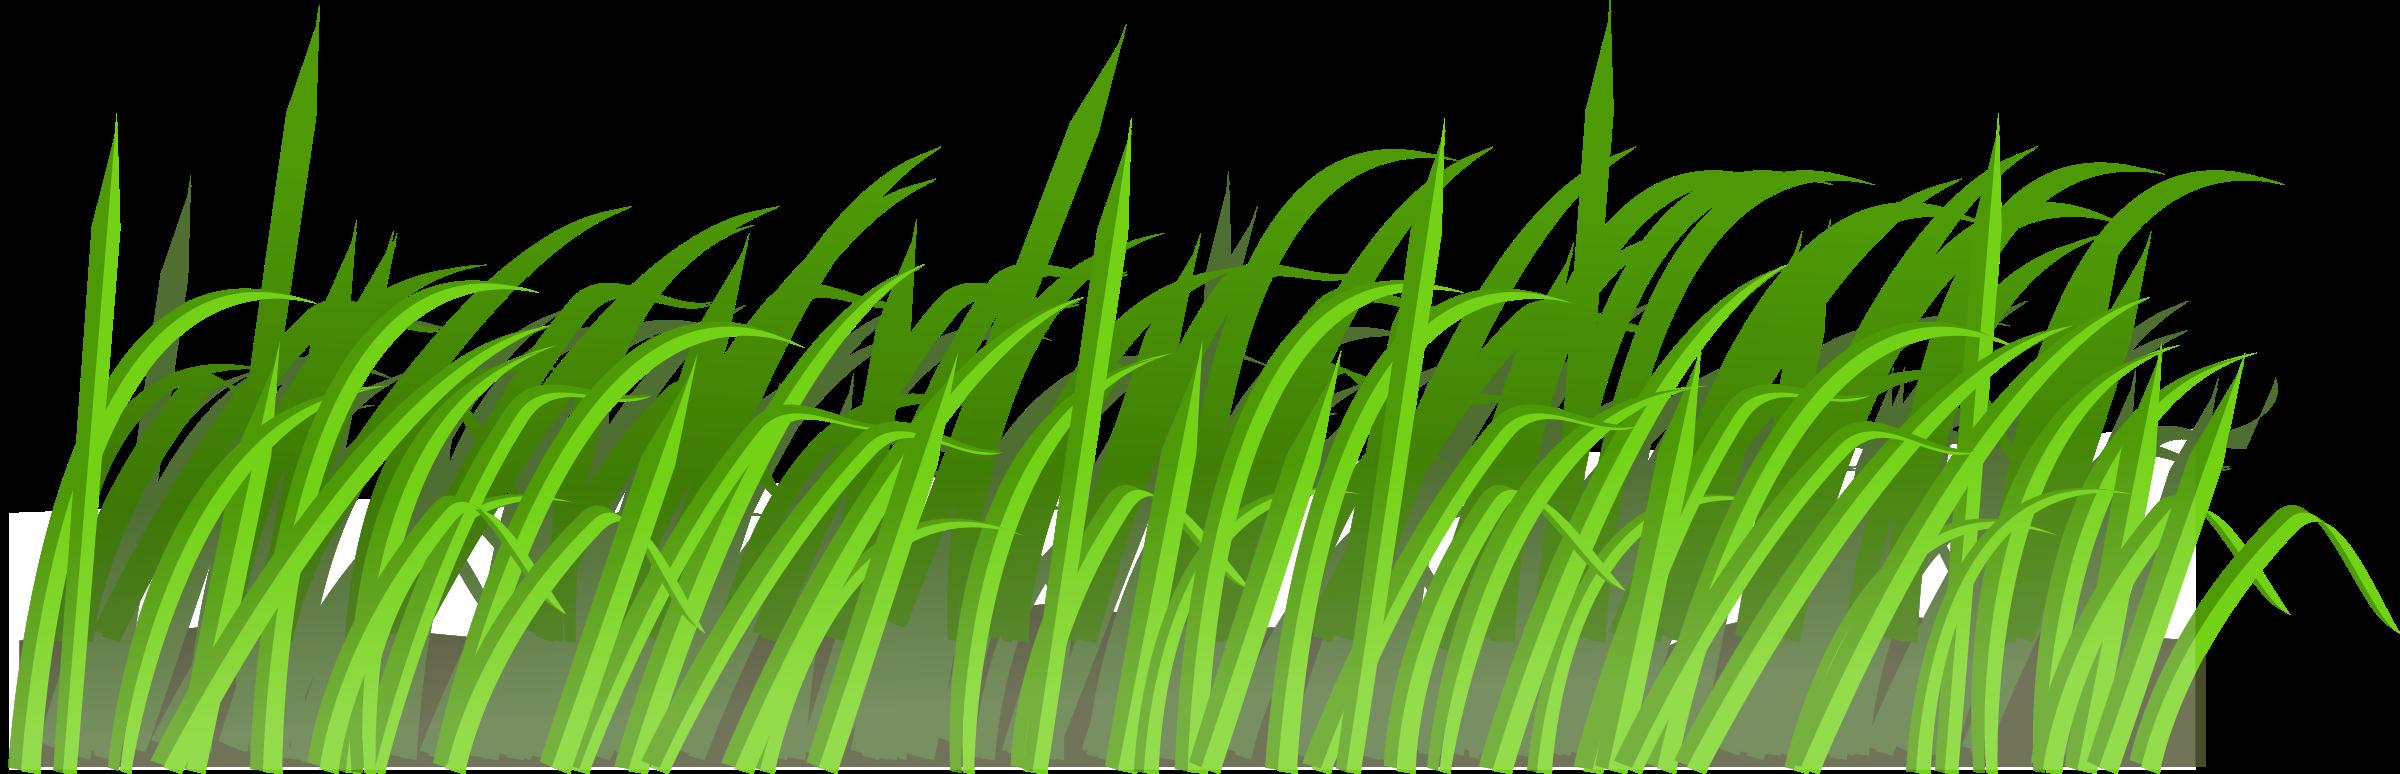 Clipart texture big image. Grass vector png